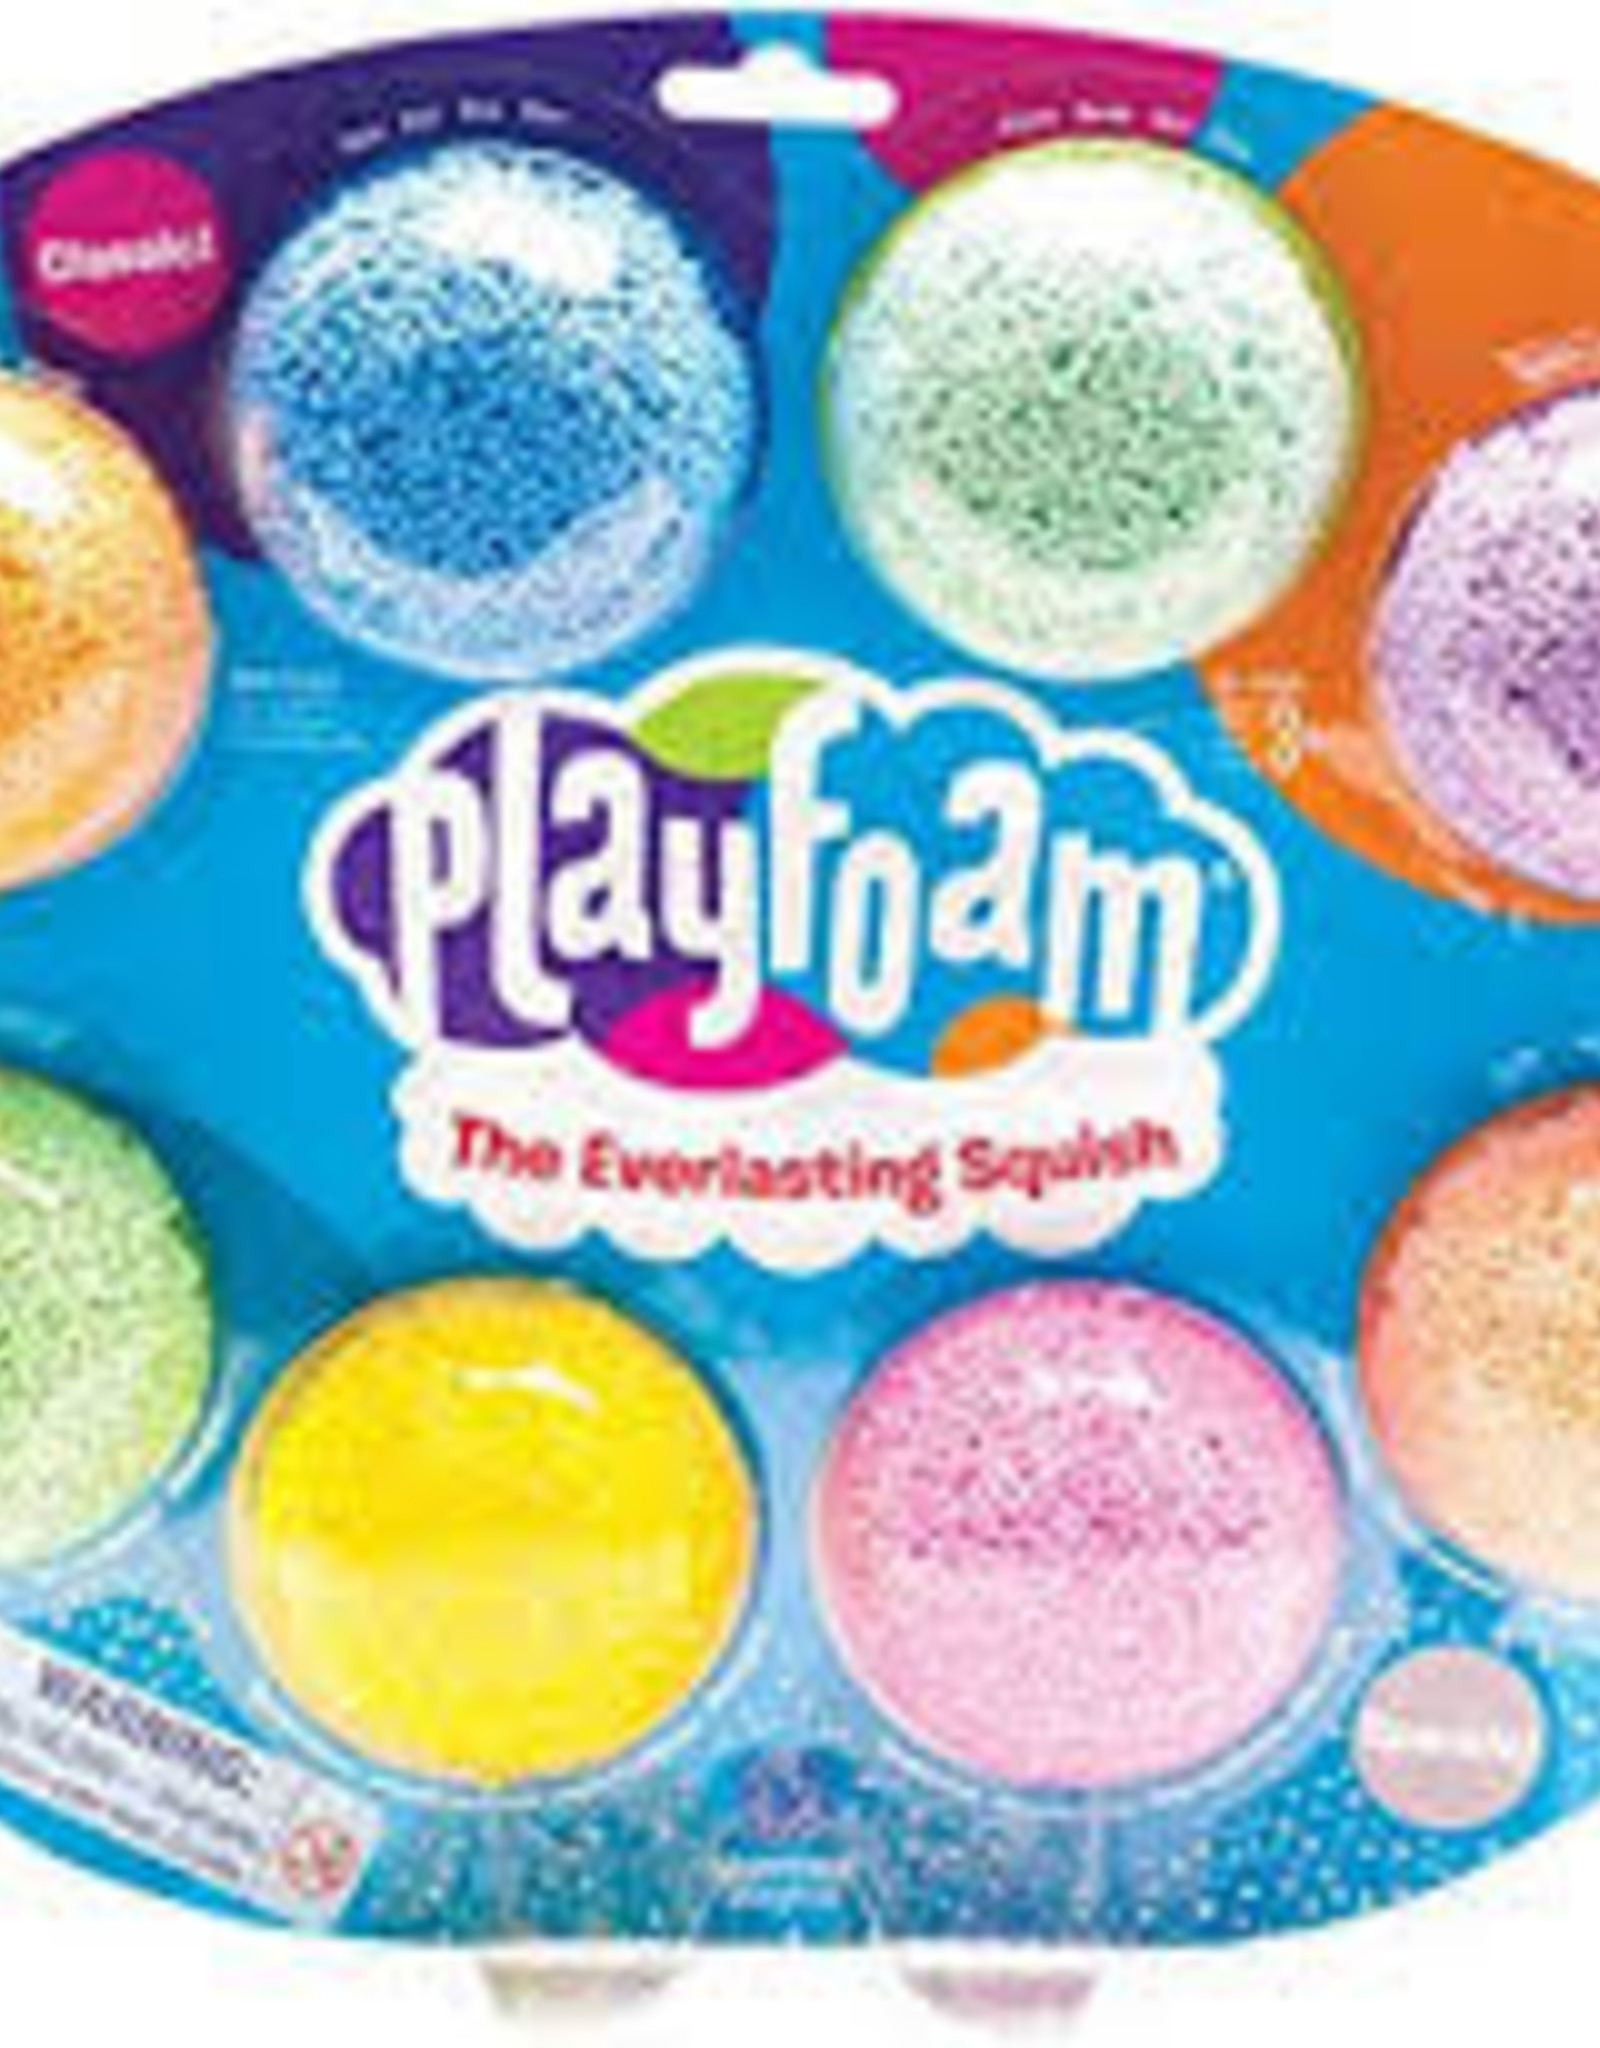 Playfoam Playfoam 8pk